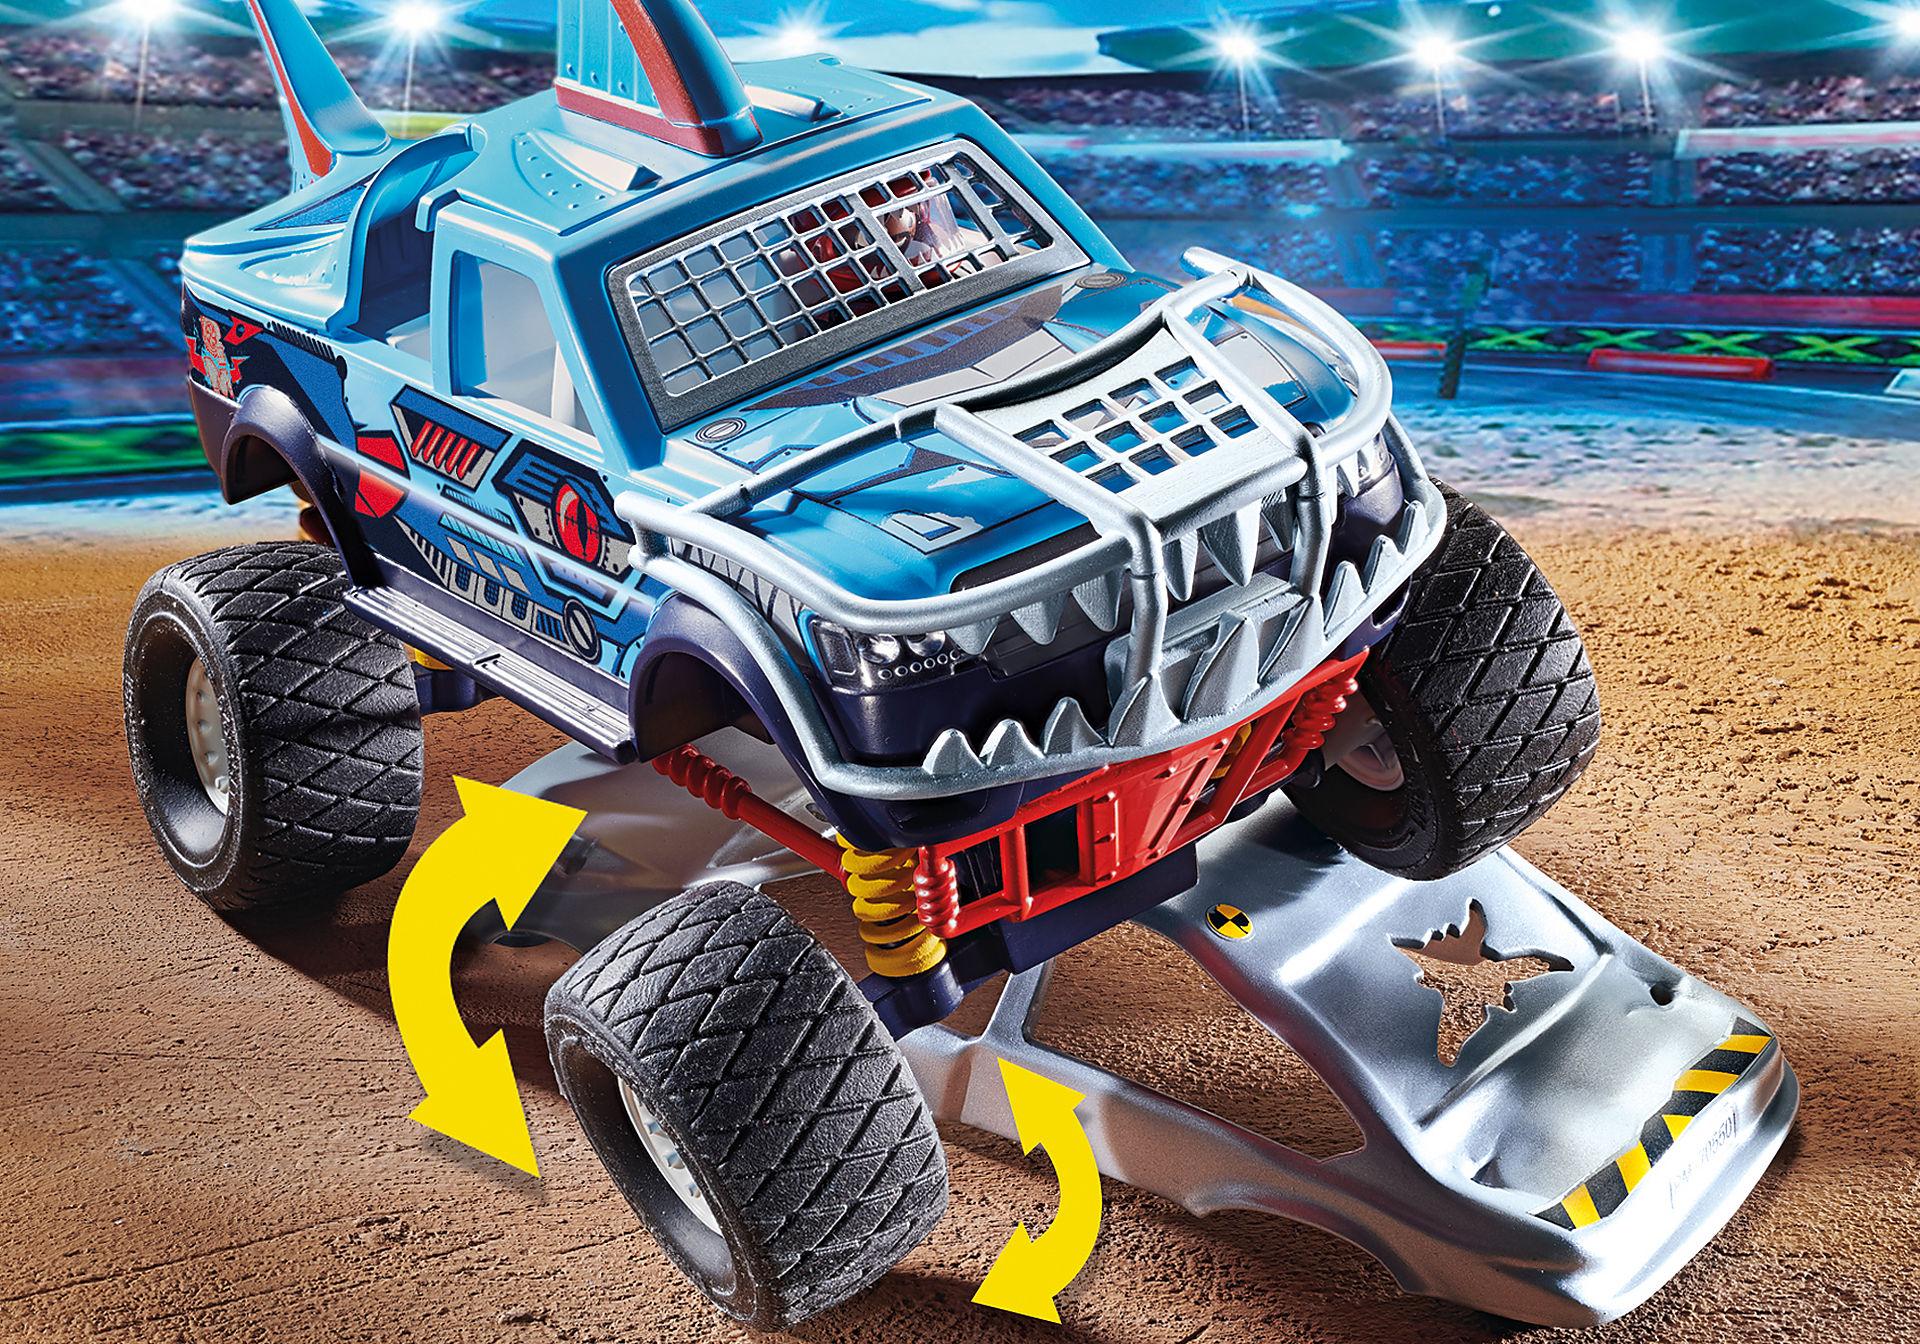 70550 Pokaz kaskaderski: Monster Truck Rekin zoom image4